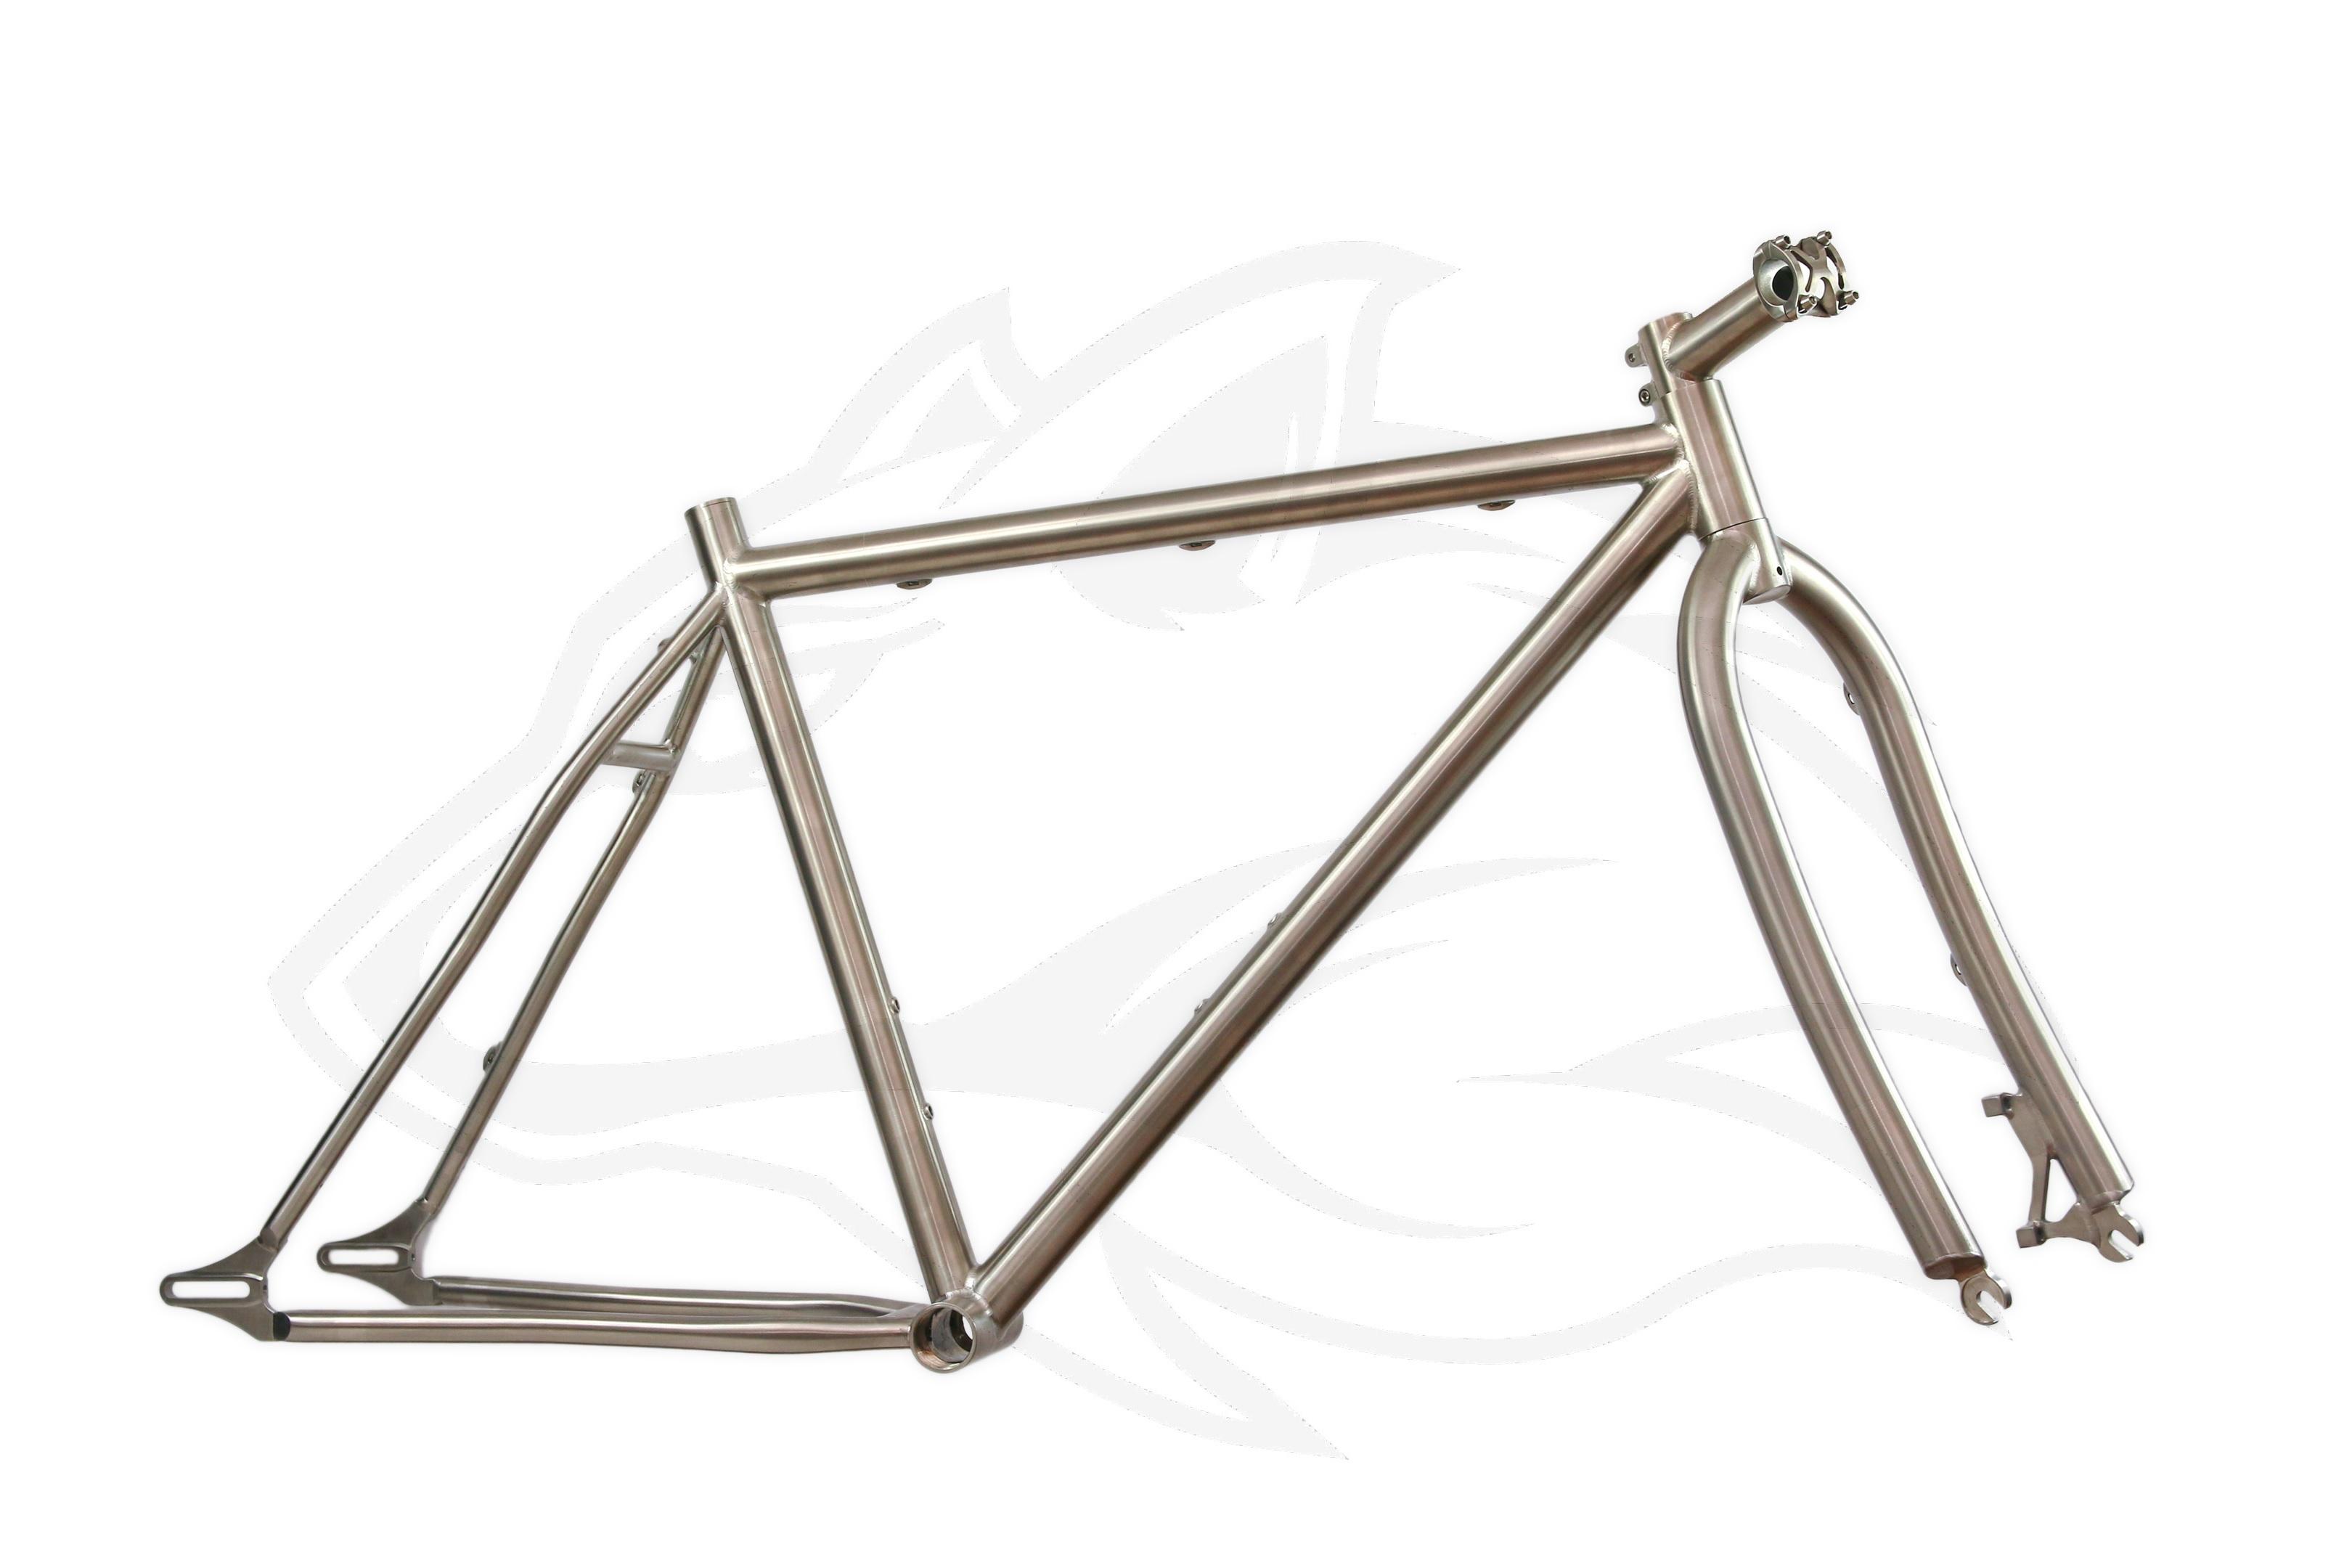 Titan Fatbike Set inkl. Gabel - Individueller Fahrradbau - Titanteile